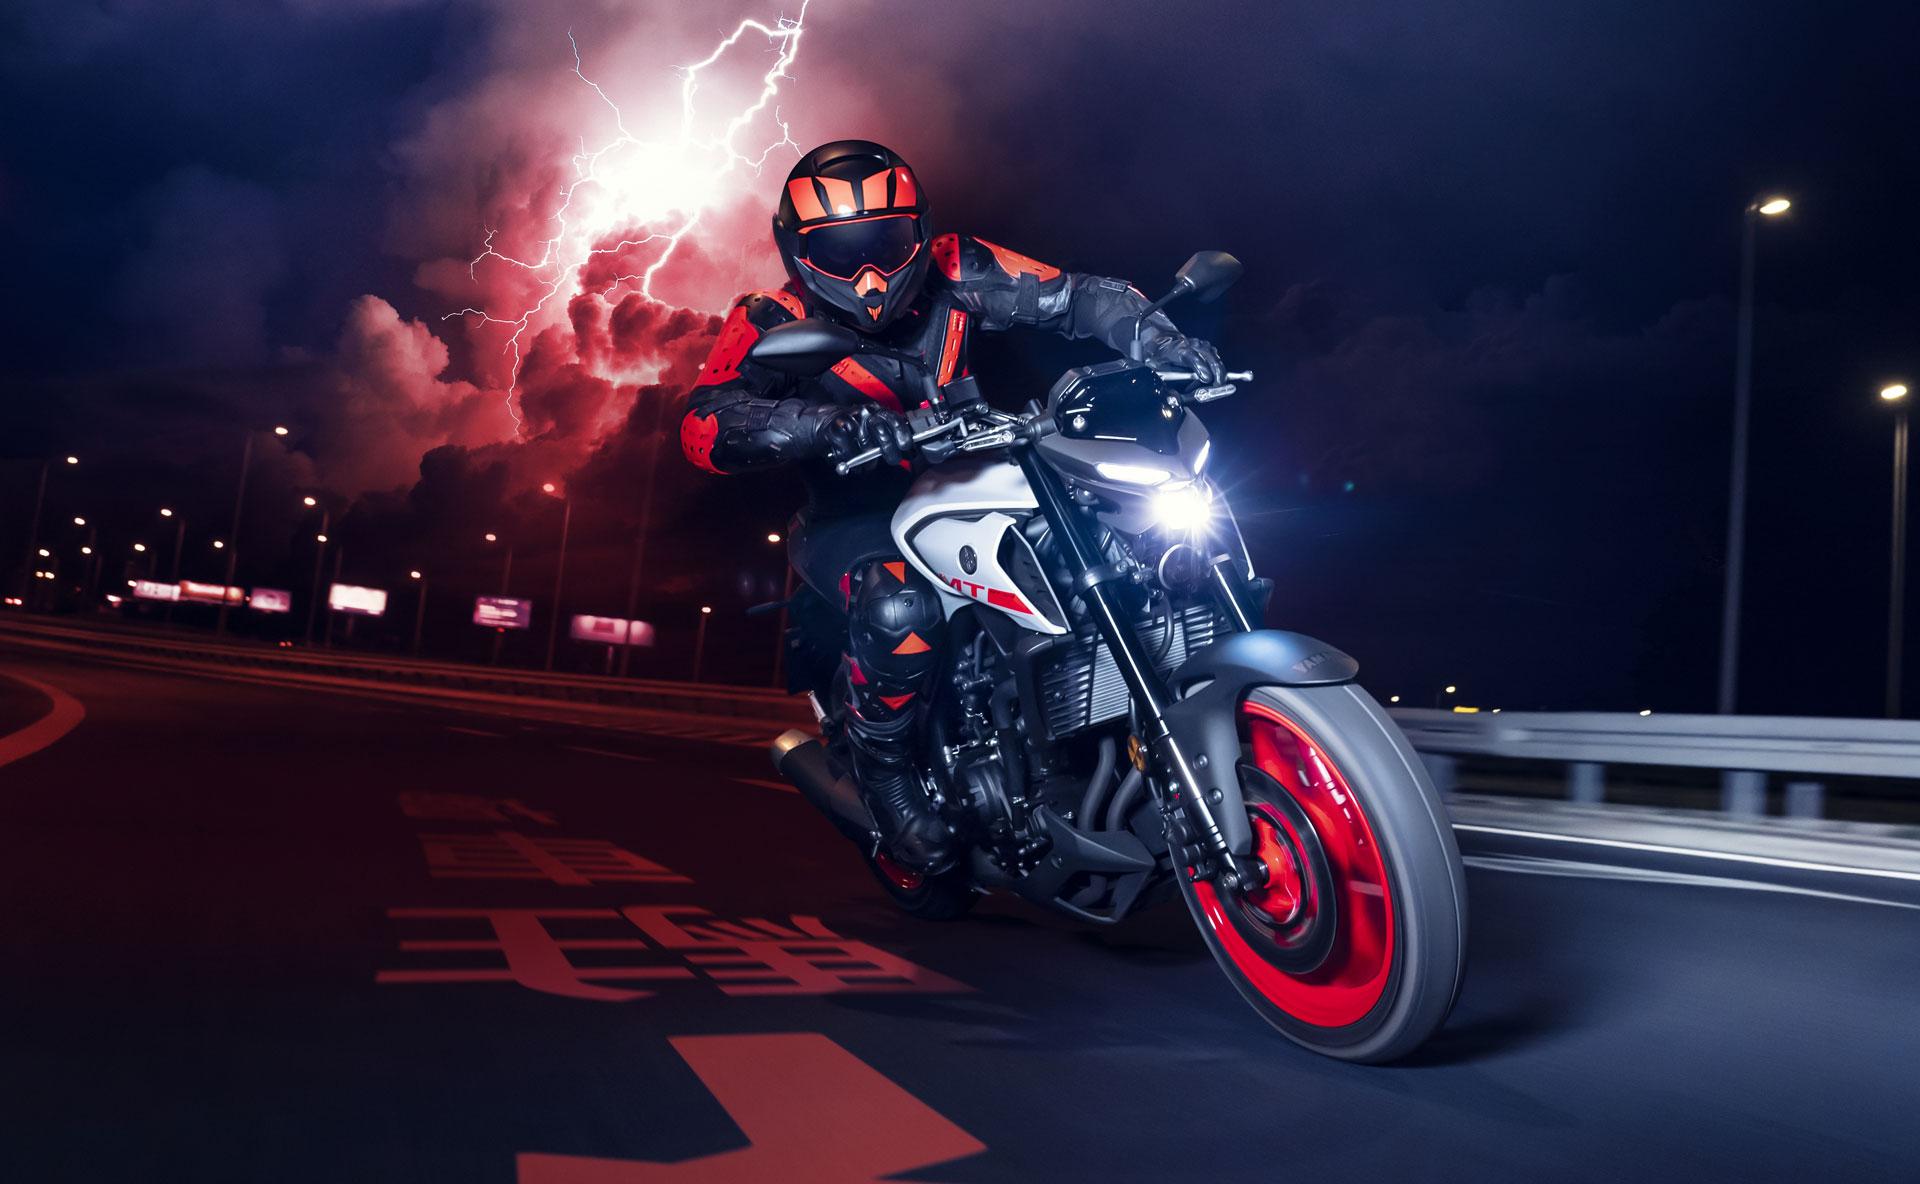 Yamaha MT-03 2020 | MotorCentrumWest